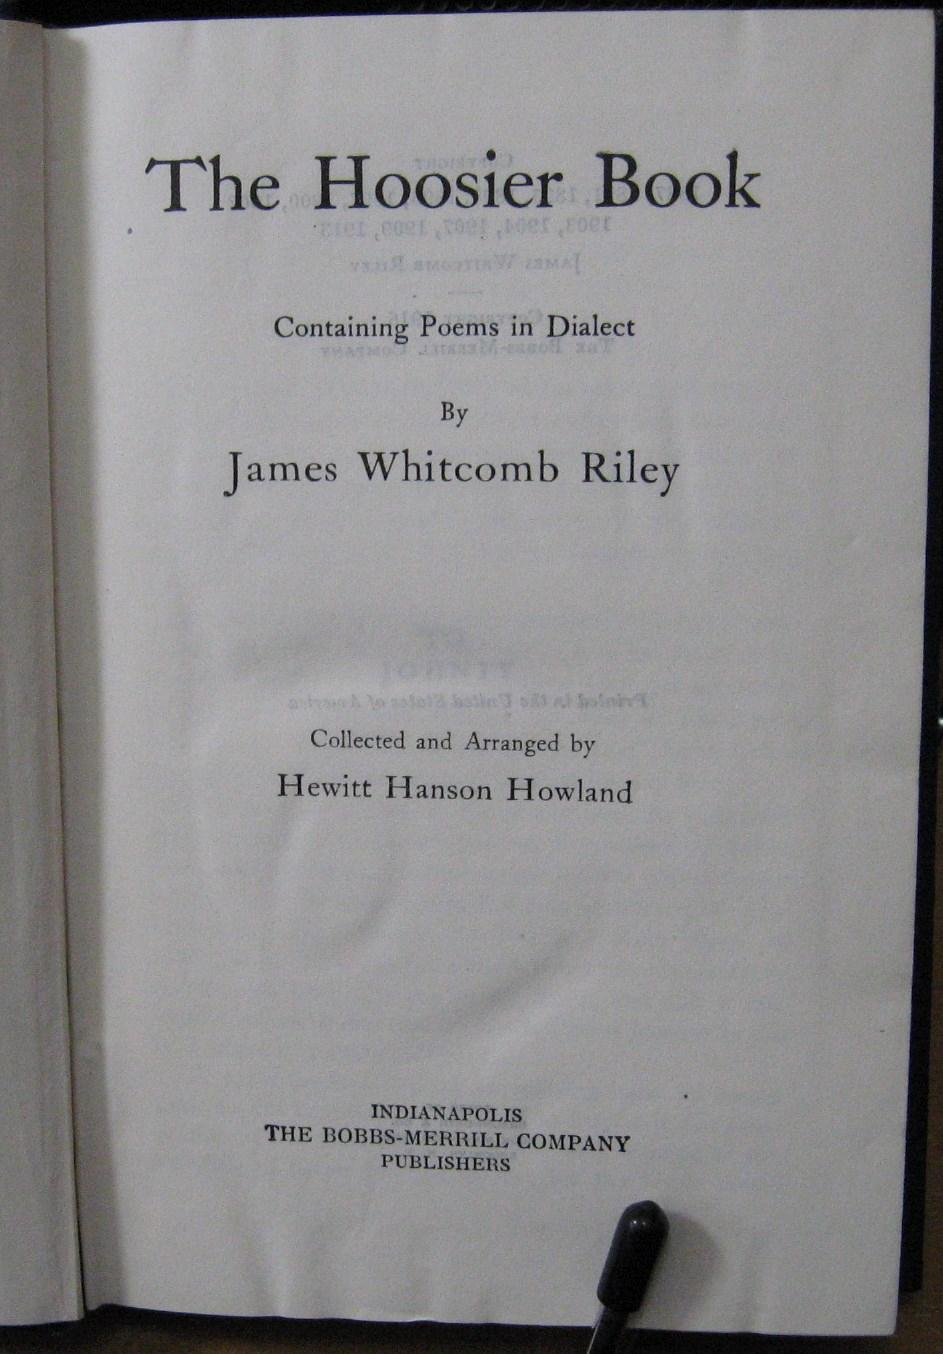 james whitcomb riley poems